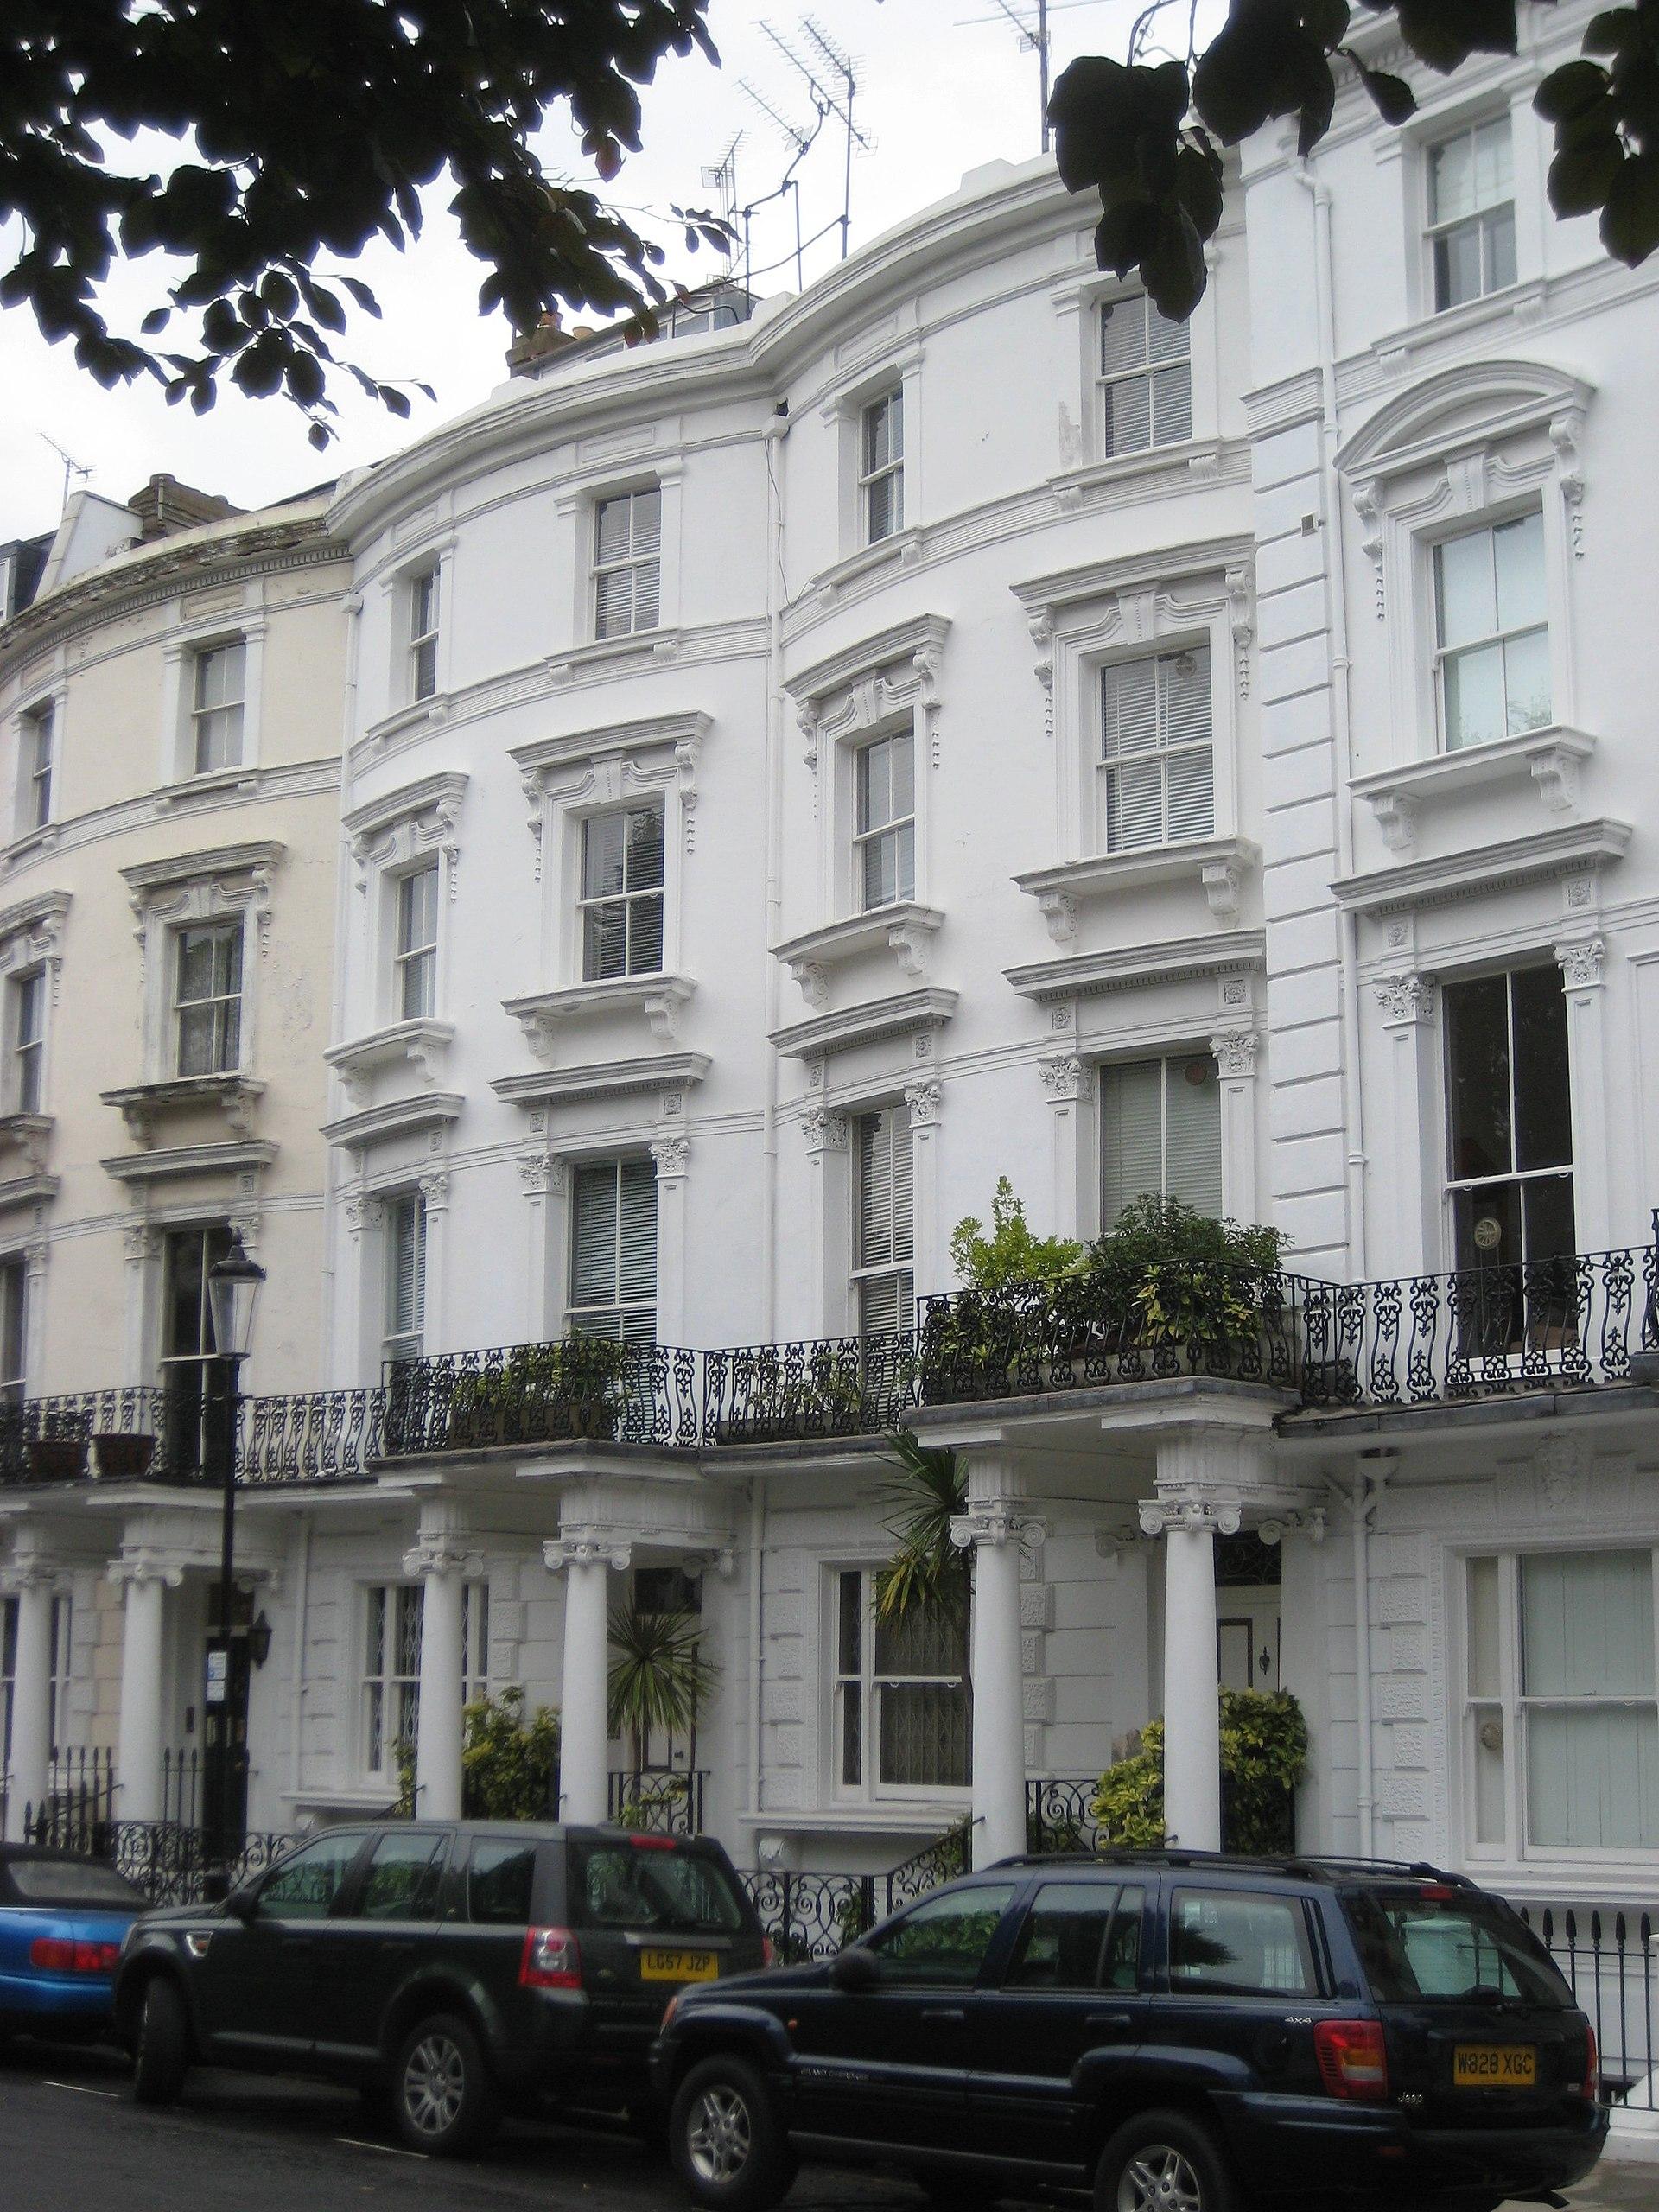 Samarkand Hotel  Lansdowne Crescent Notting Hill London England